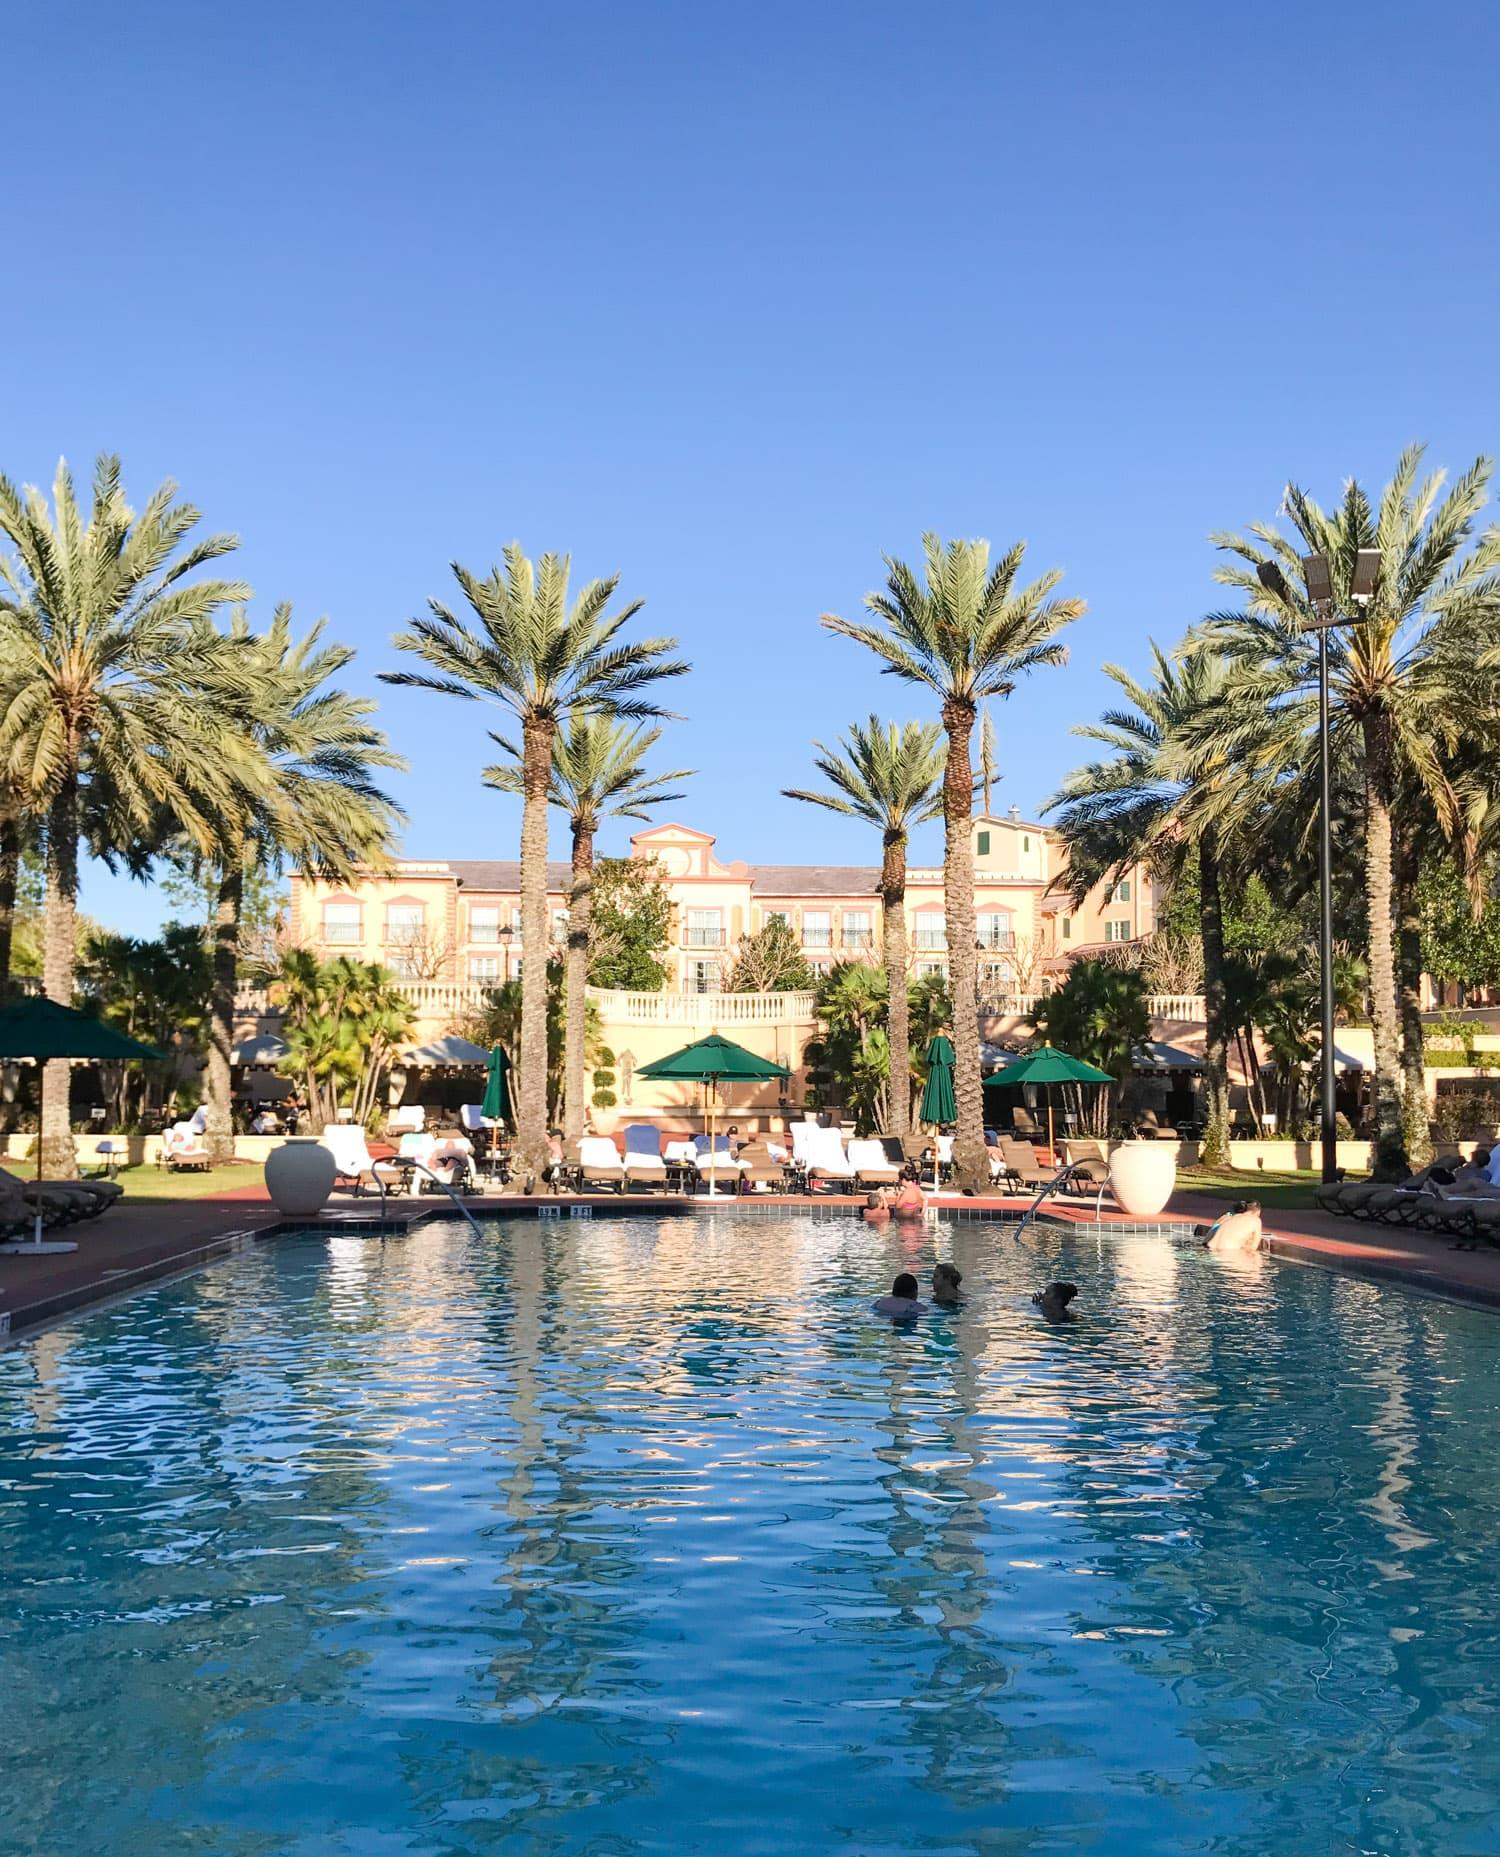 Universal resort Portofino Bay hotel pool Orlando florida